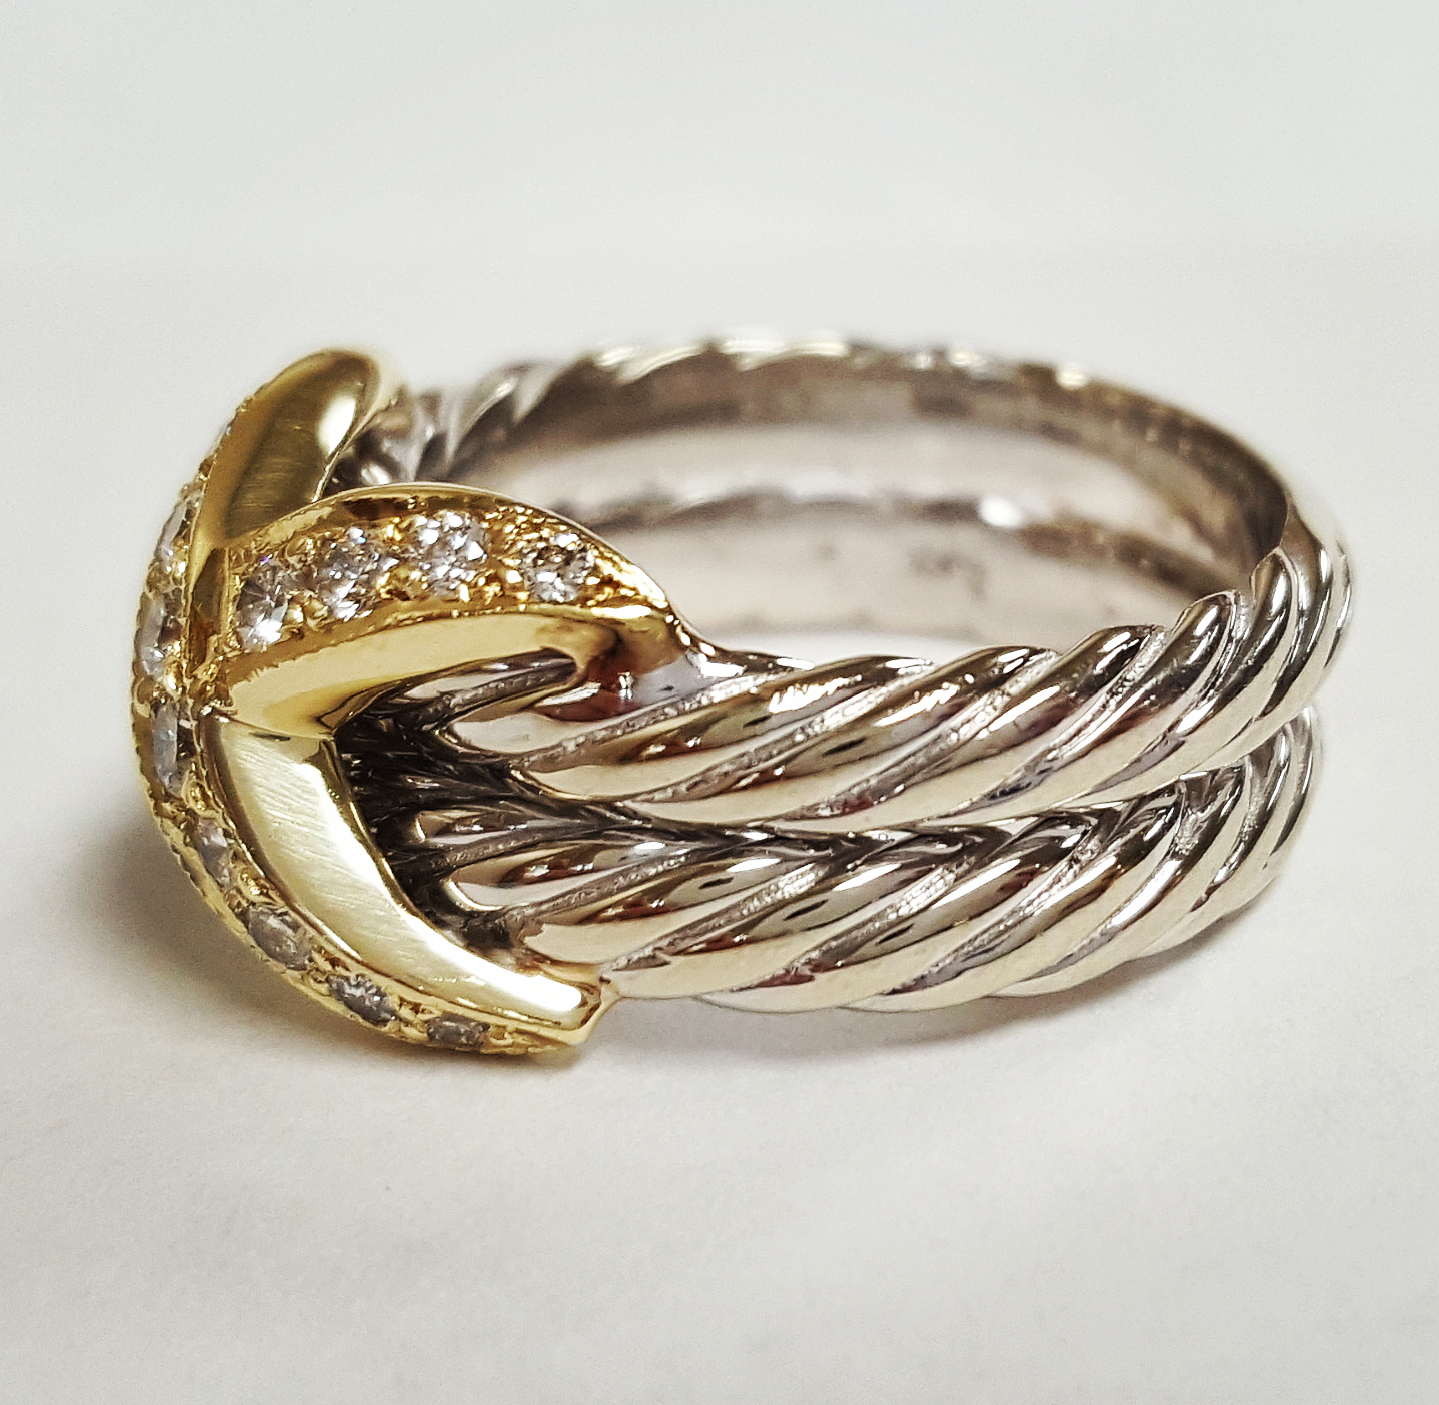 david yurman replica jewelry manufacturer style guru